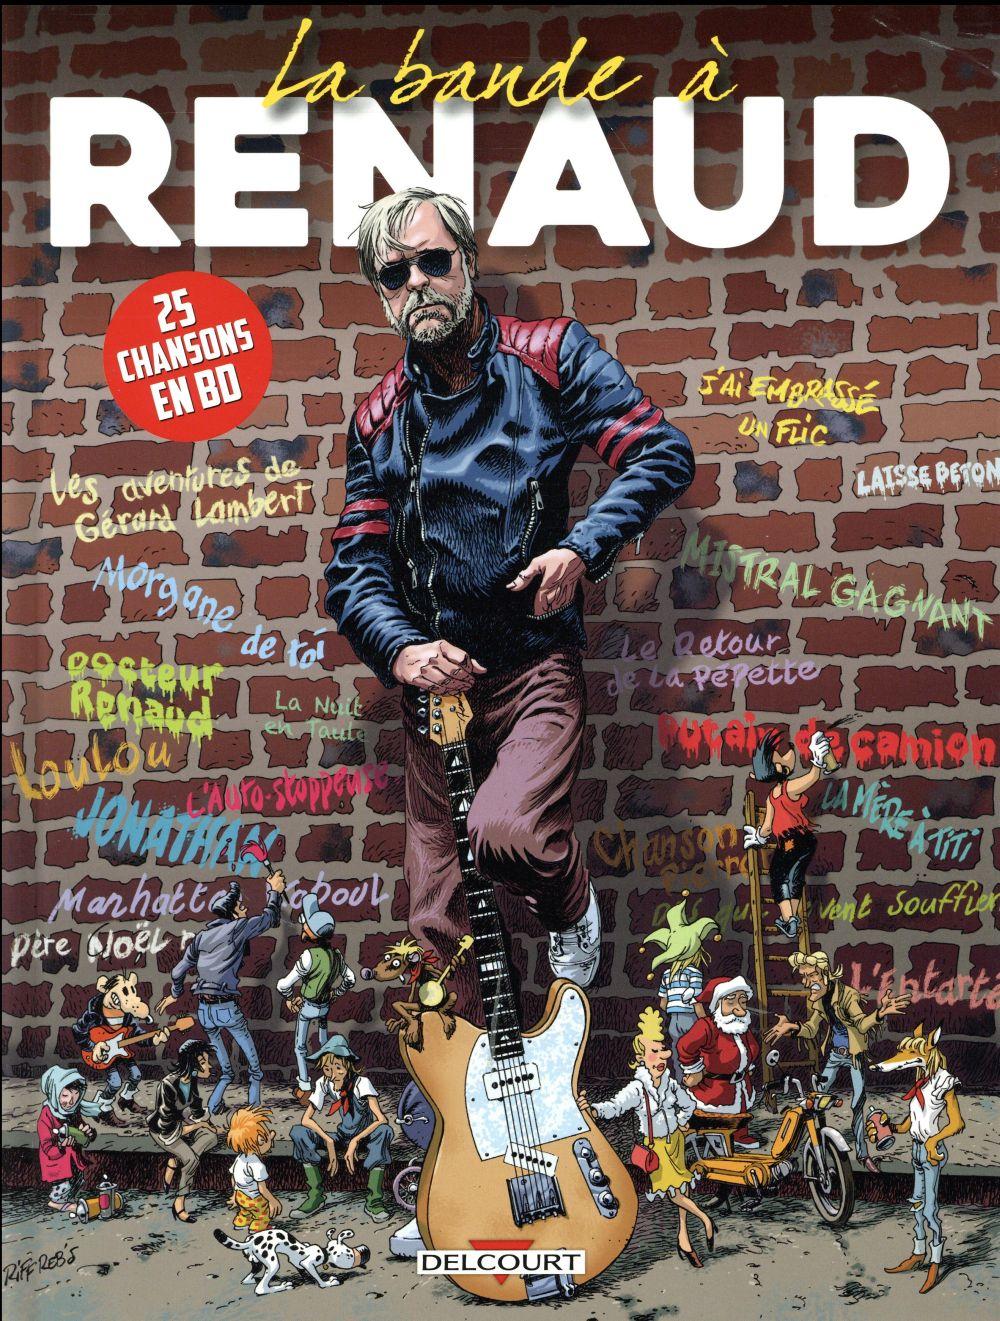 La bande à Renaud ; 25 chansons en BD